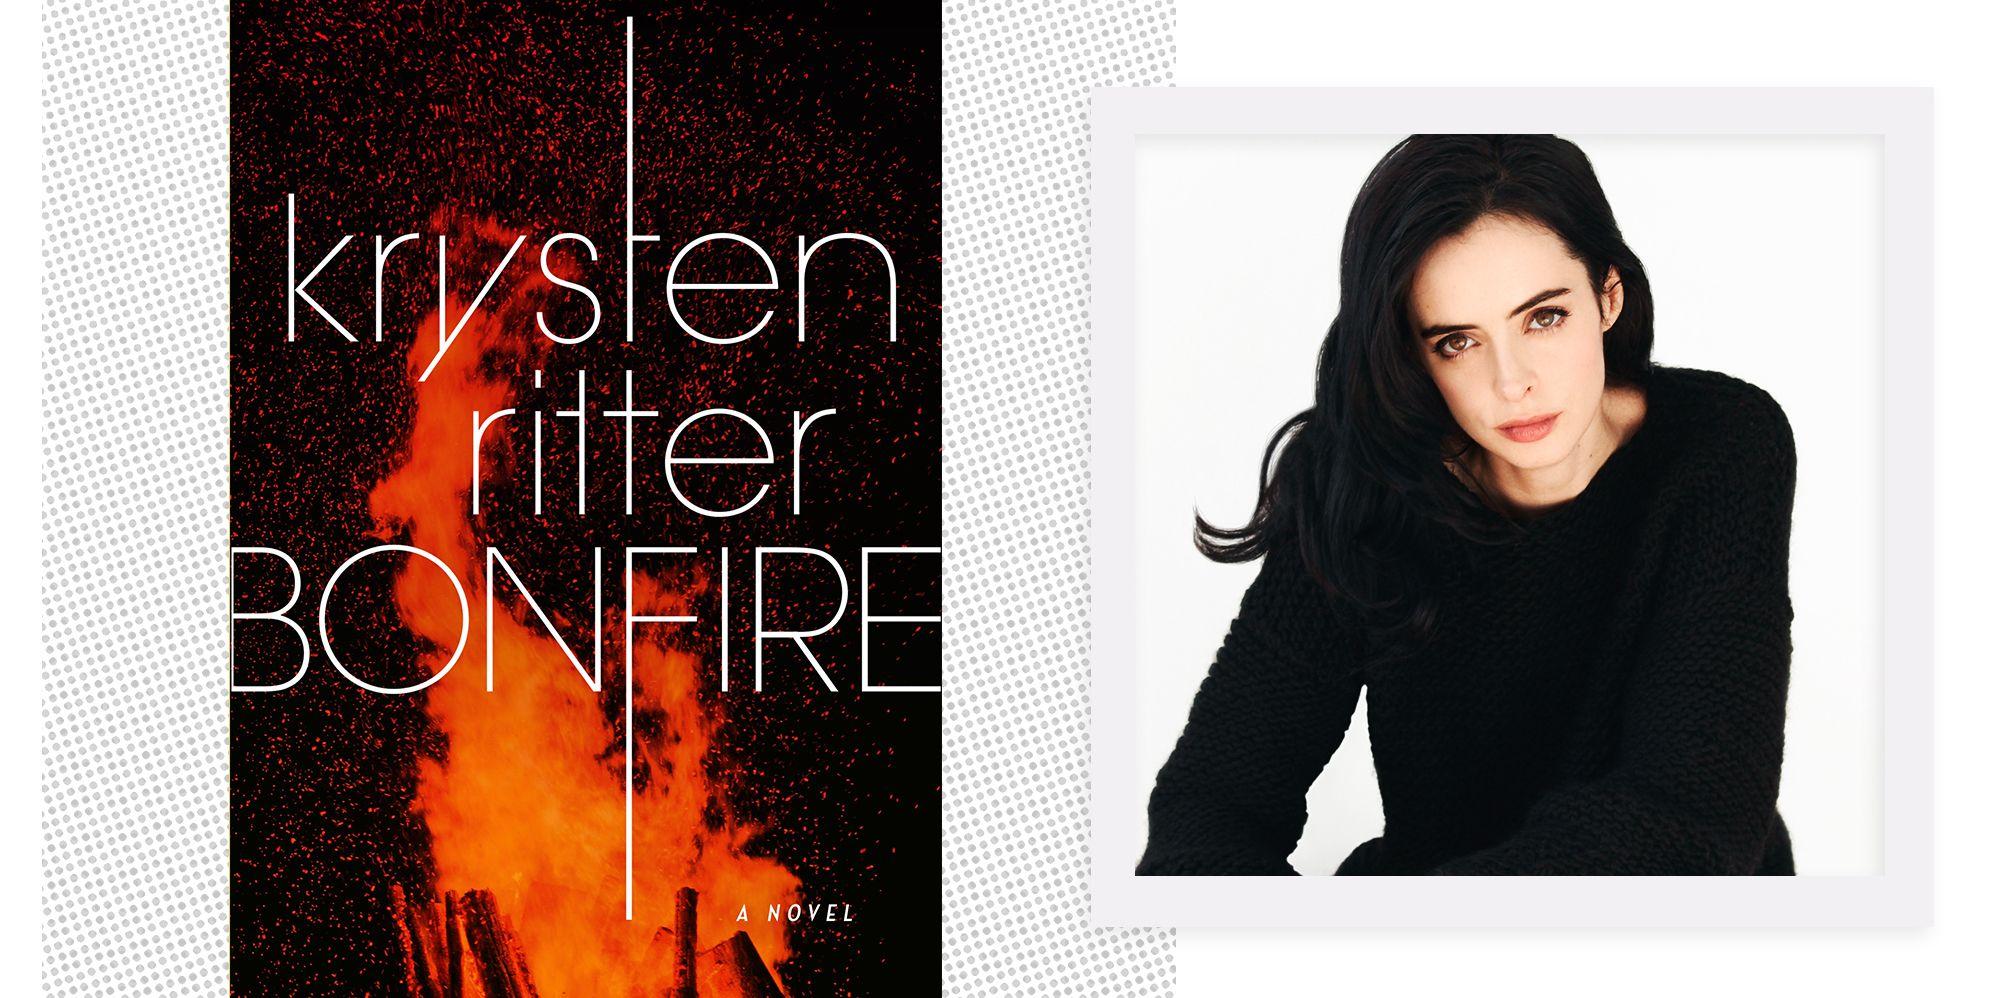 Krysten Ritter Bonfire